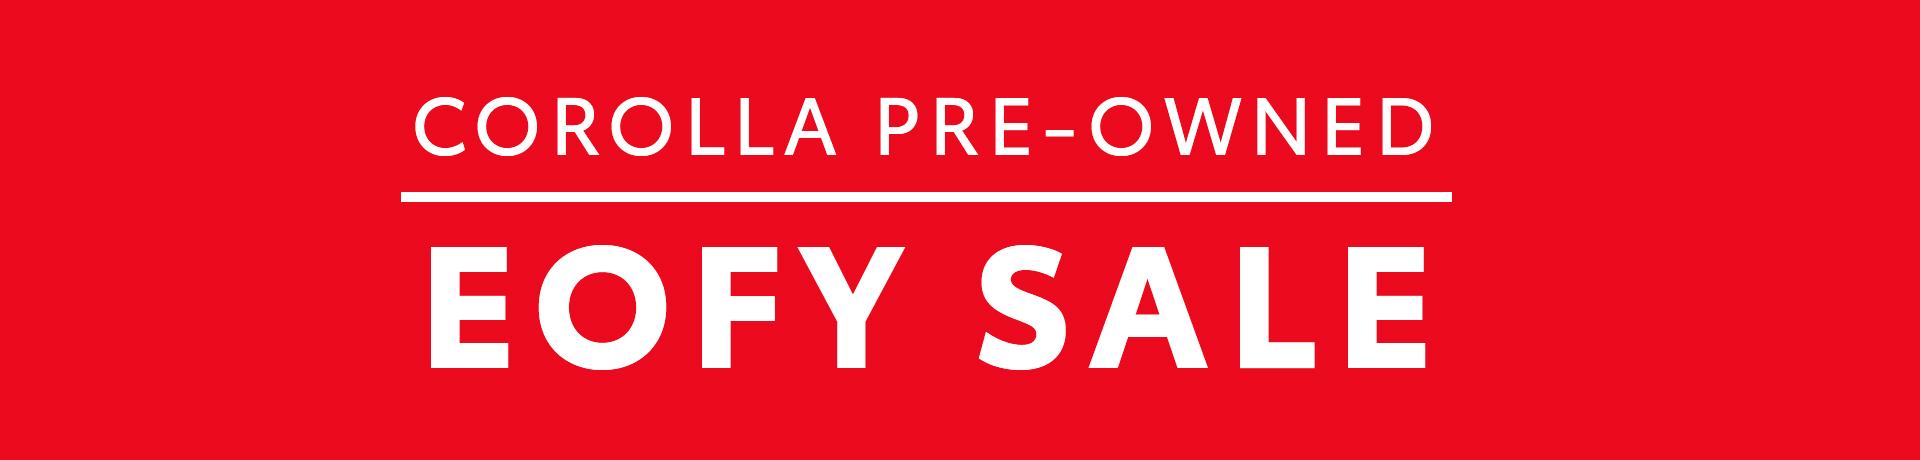 EOFY Corolla Sale Desktop Banner